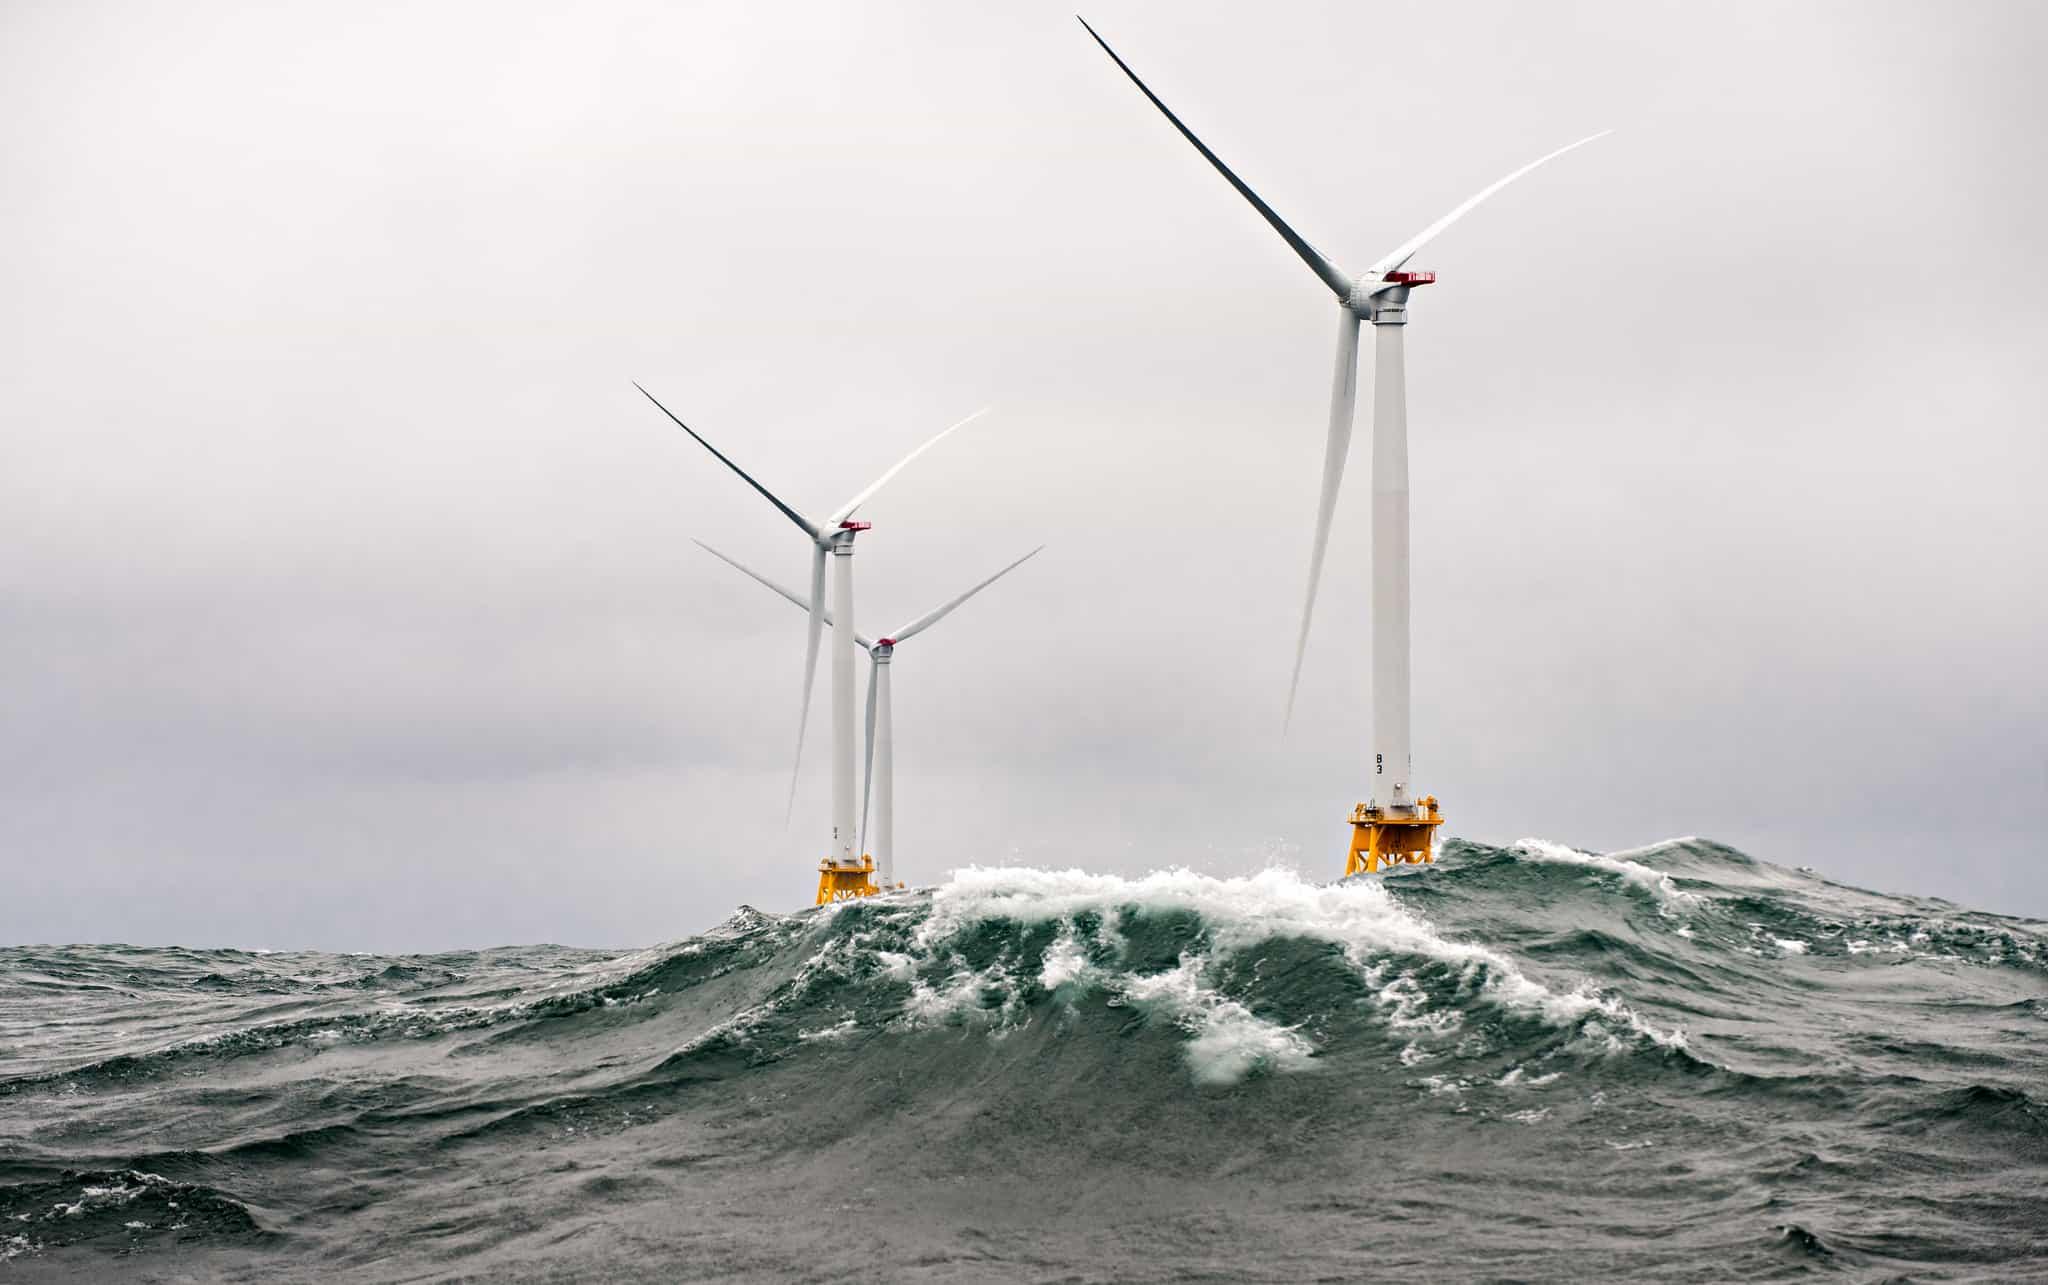 Best Motor for Wind Turbines